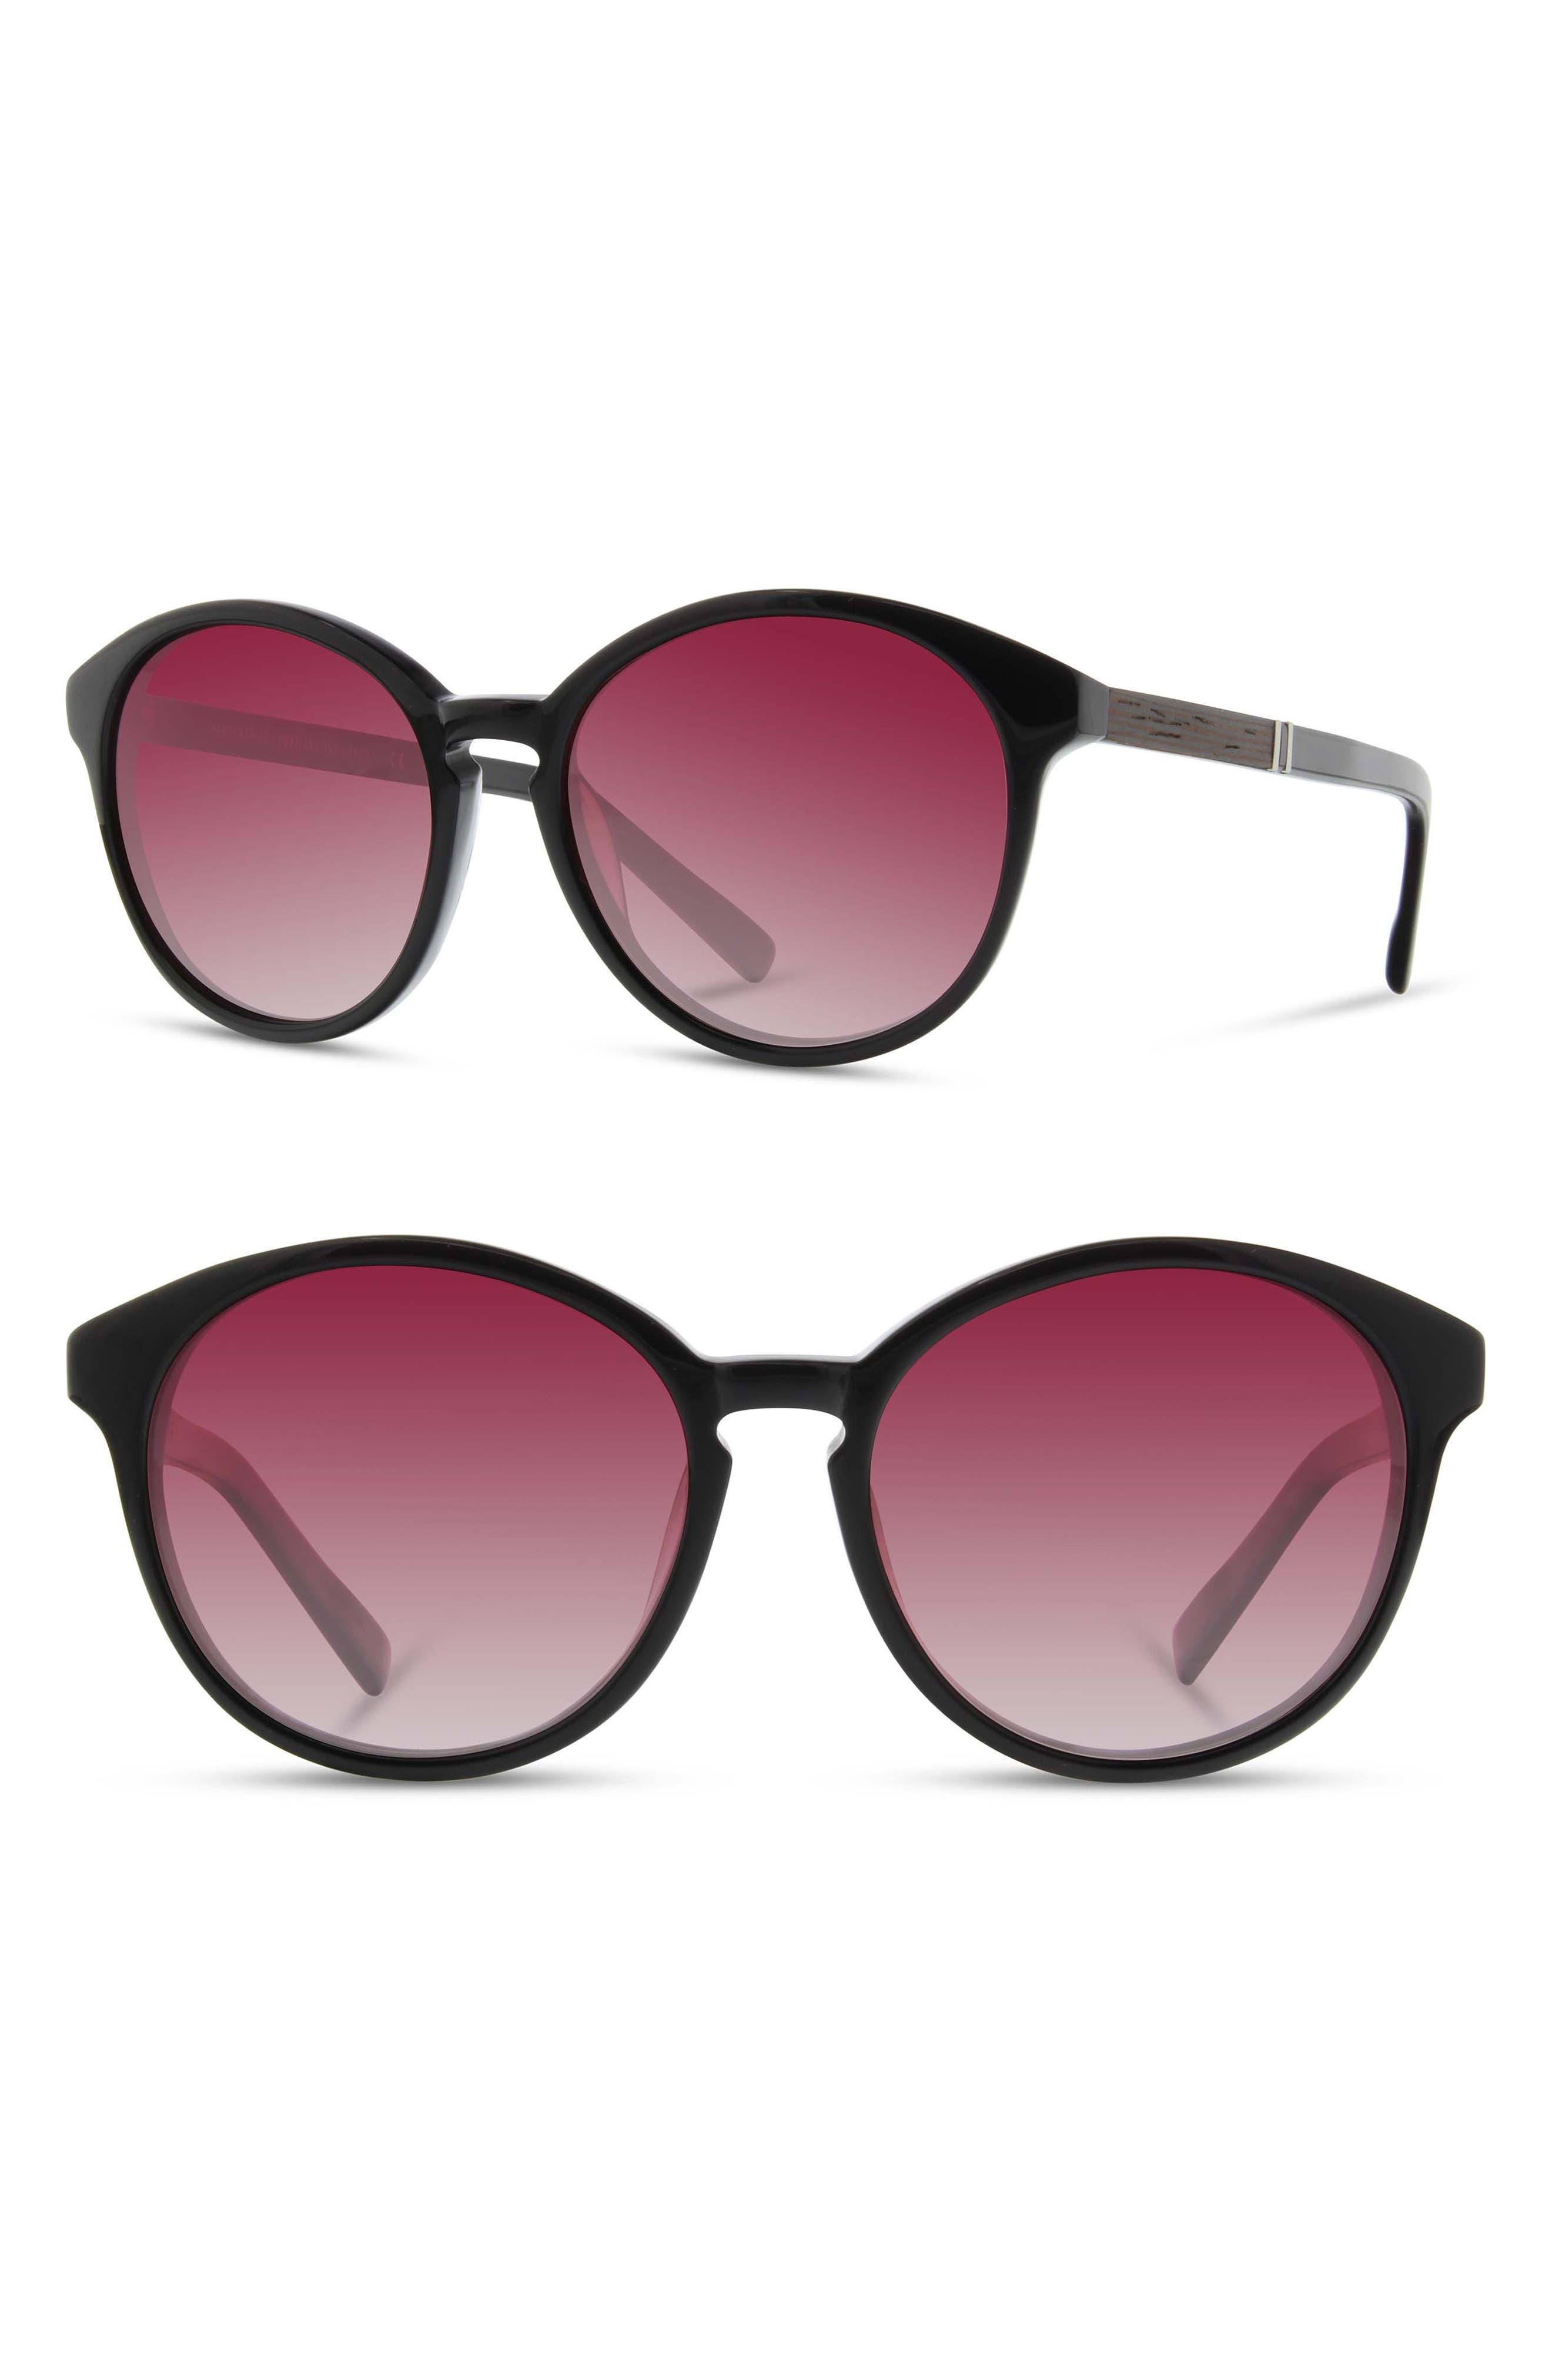 'Bailey' 53mm Polarized Sunglasses,                             Main thumbnail 1, color,                             BLACK/ EBONY/ ROSE FADE